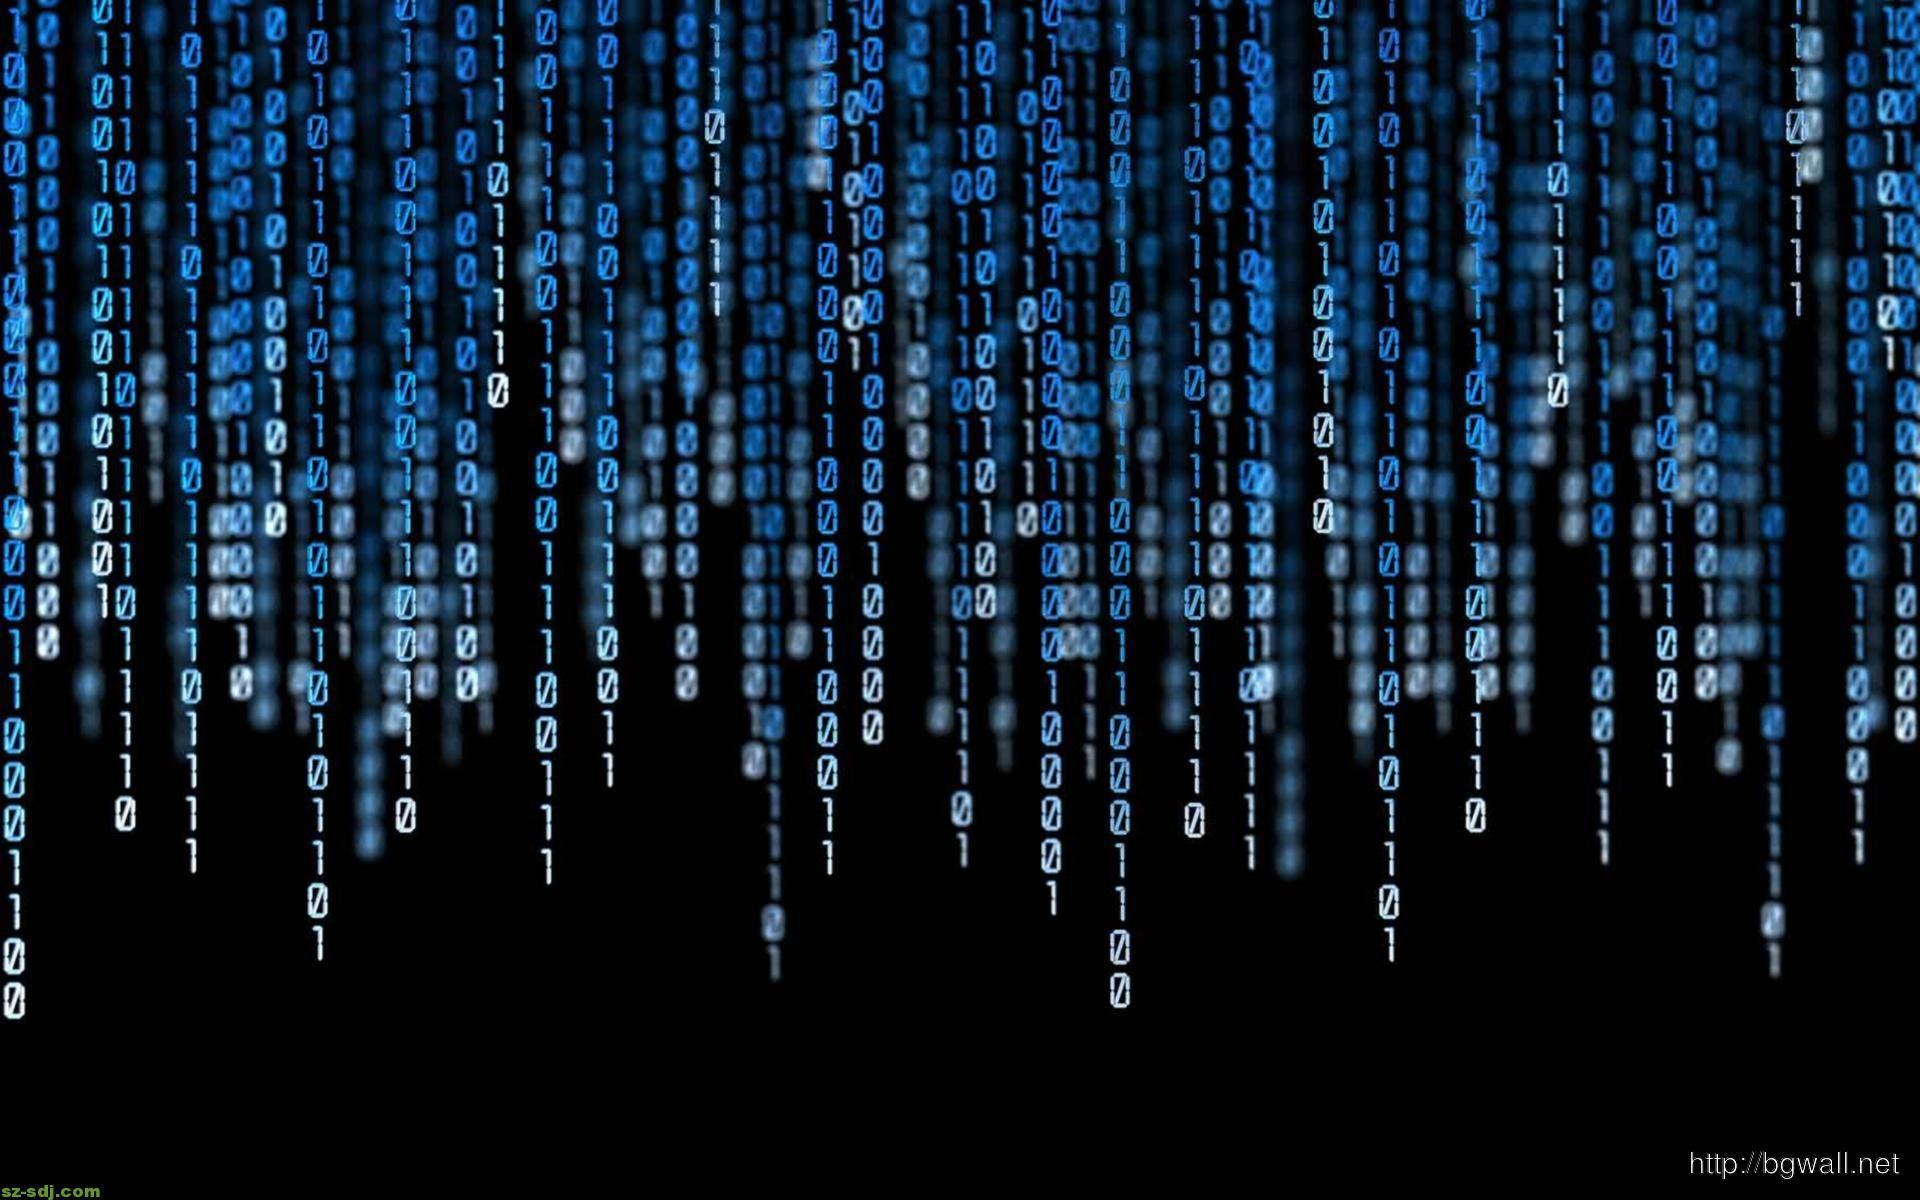 technology code computer tech wallpapers backgrounds coding hacker binary nadyn biz matrix